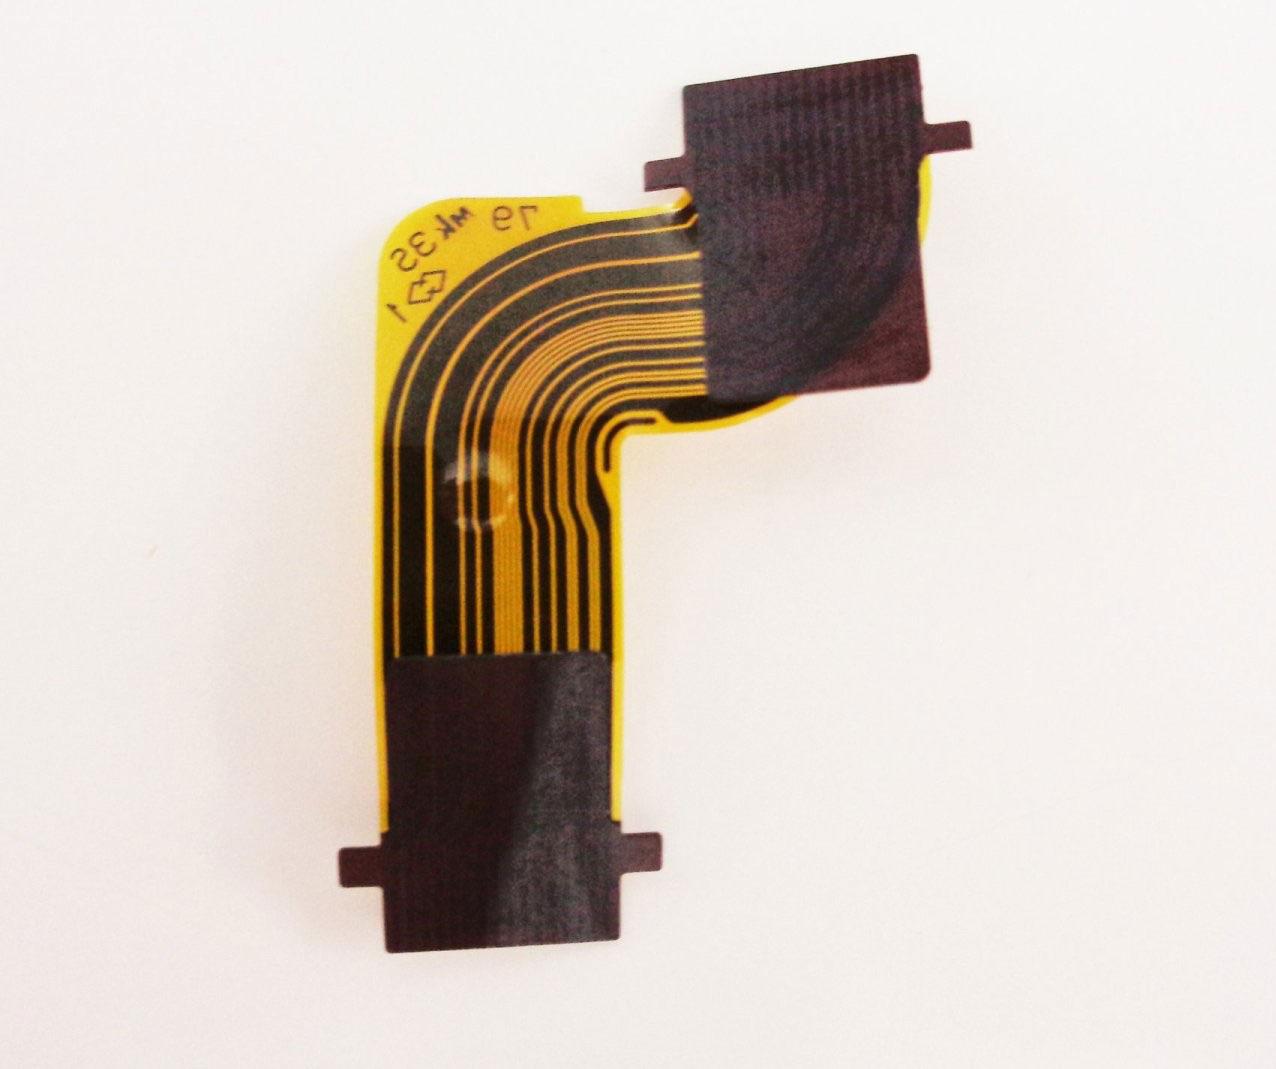 ریبون L2 و R2 دسته PS5 پلی استیشن 5 Dualsense Trigger Ribbon